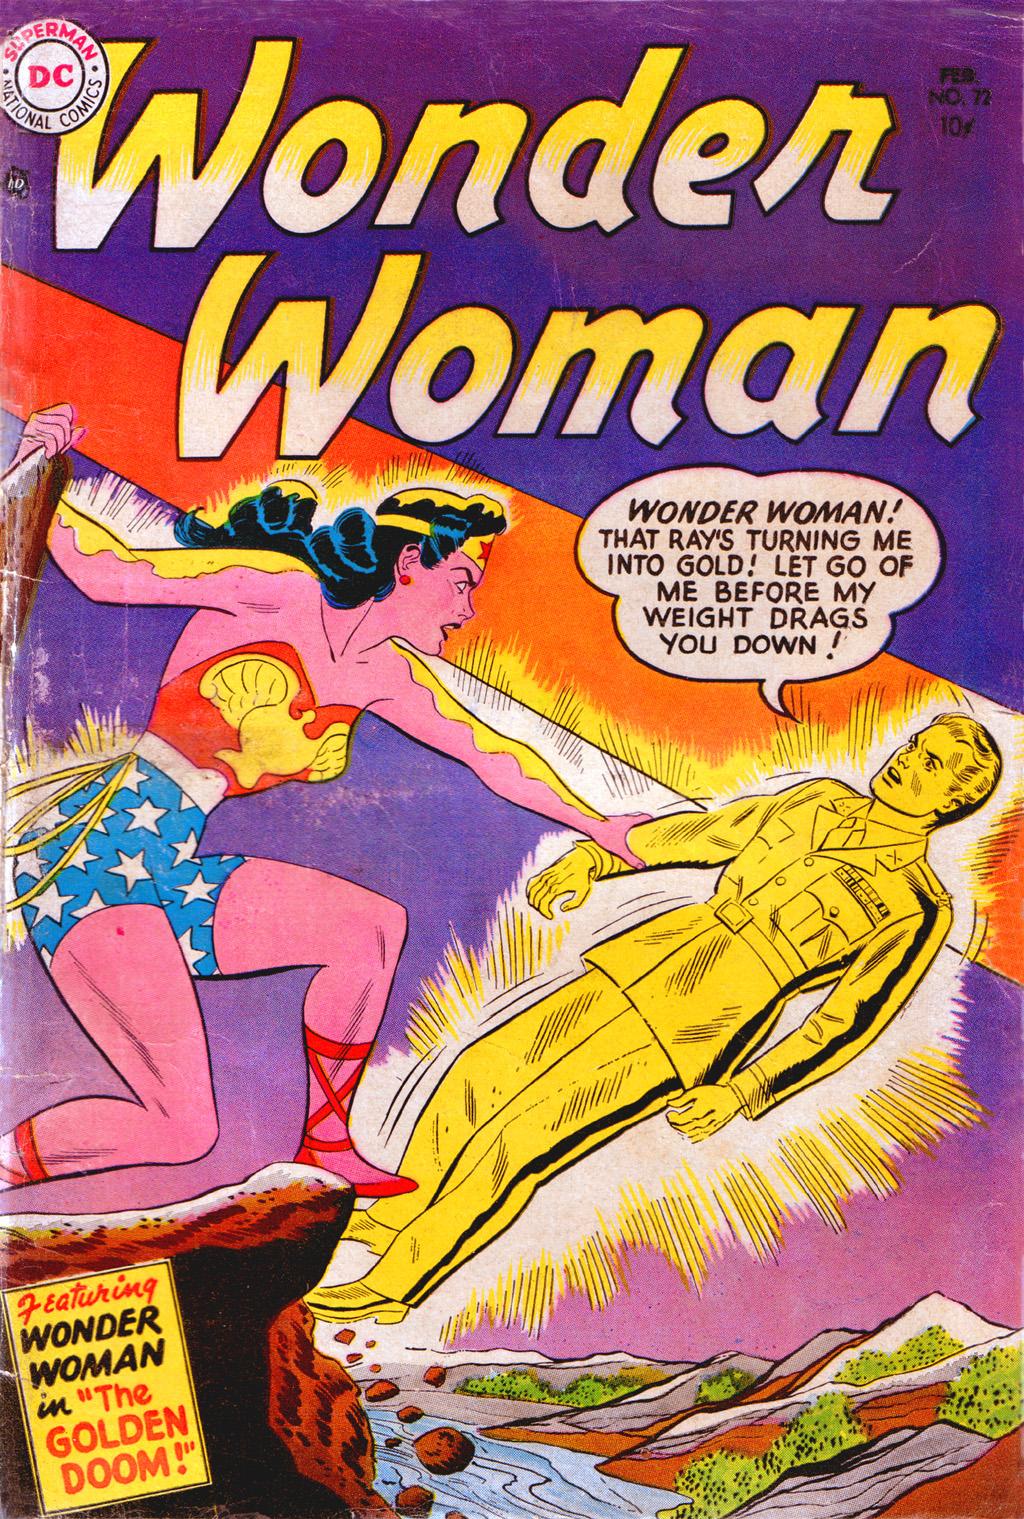 Read online Wonder Woman (1942) comic -  Issue #72 - 1